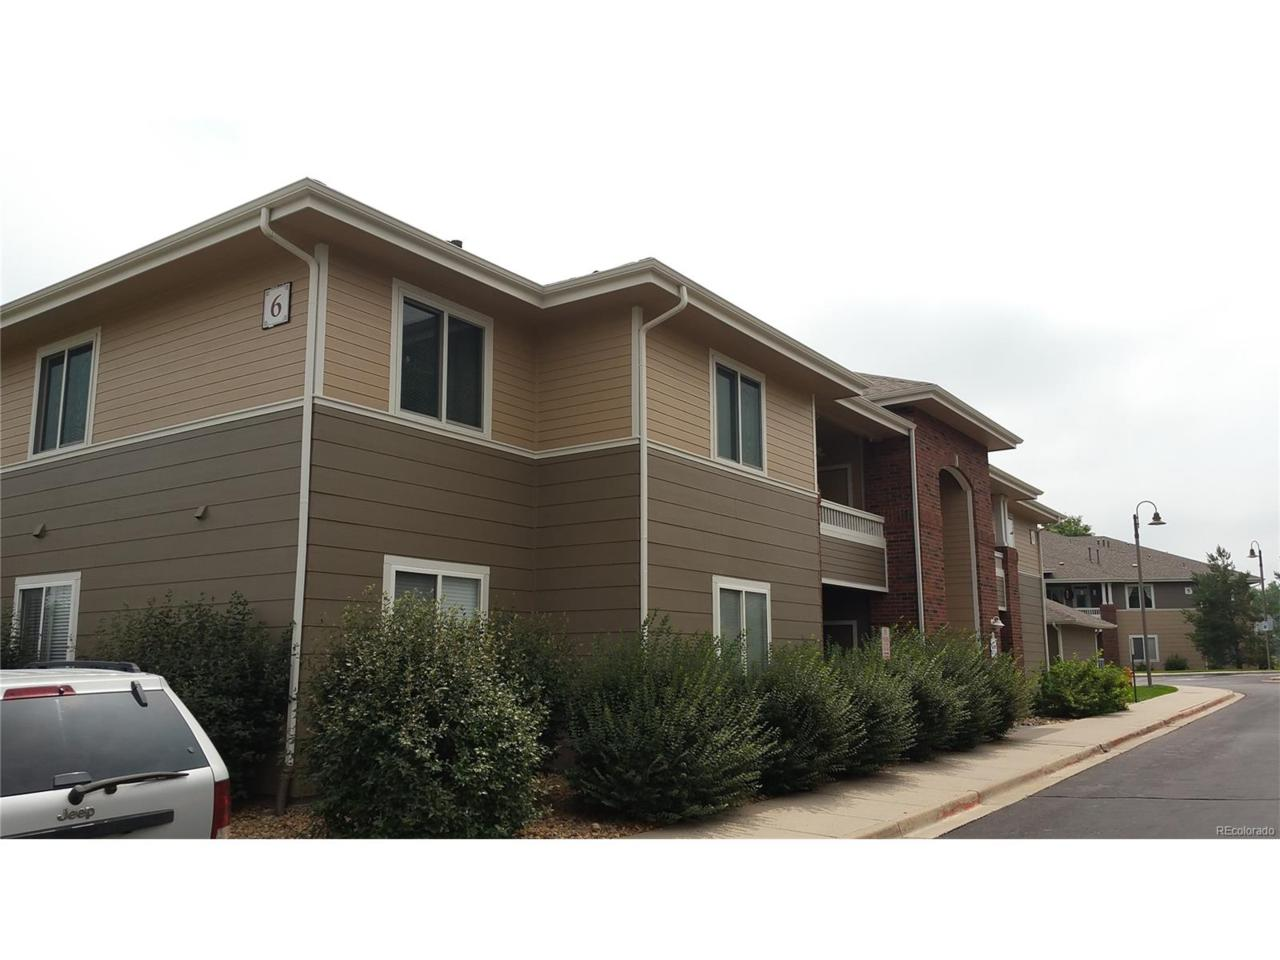 8481 W Union Avenue 6-102, Denver, CO 80123 (MLS #6370195) :: 8z Real Estate